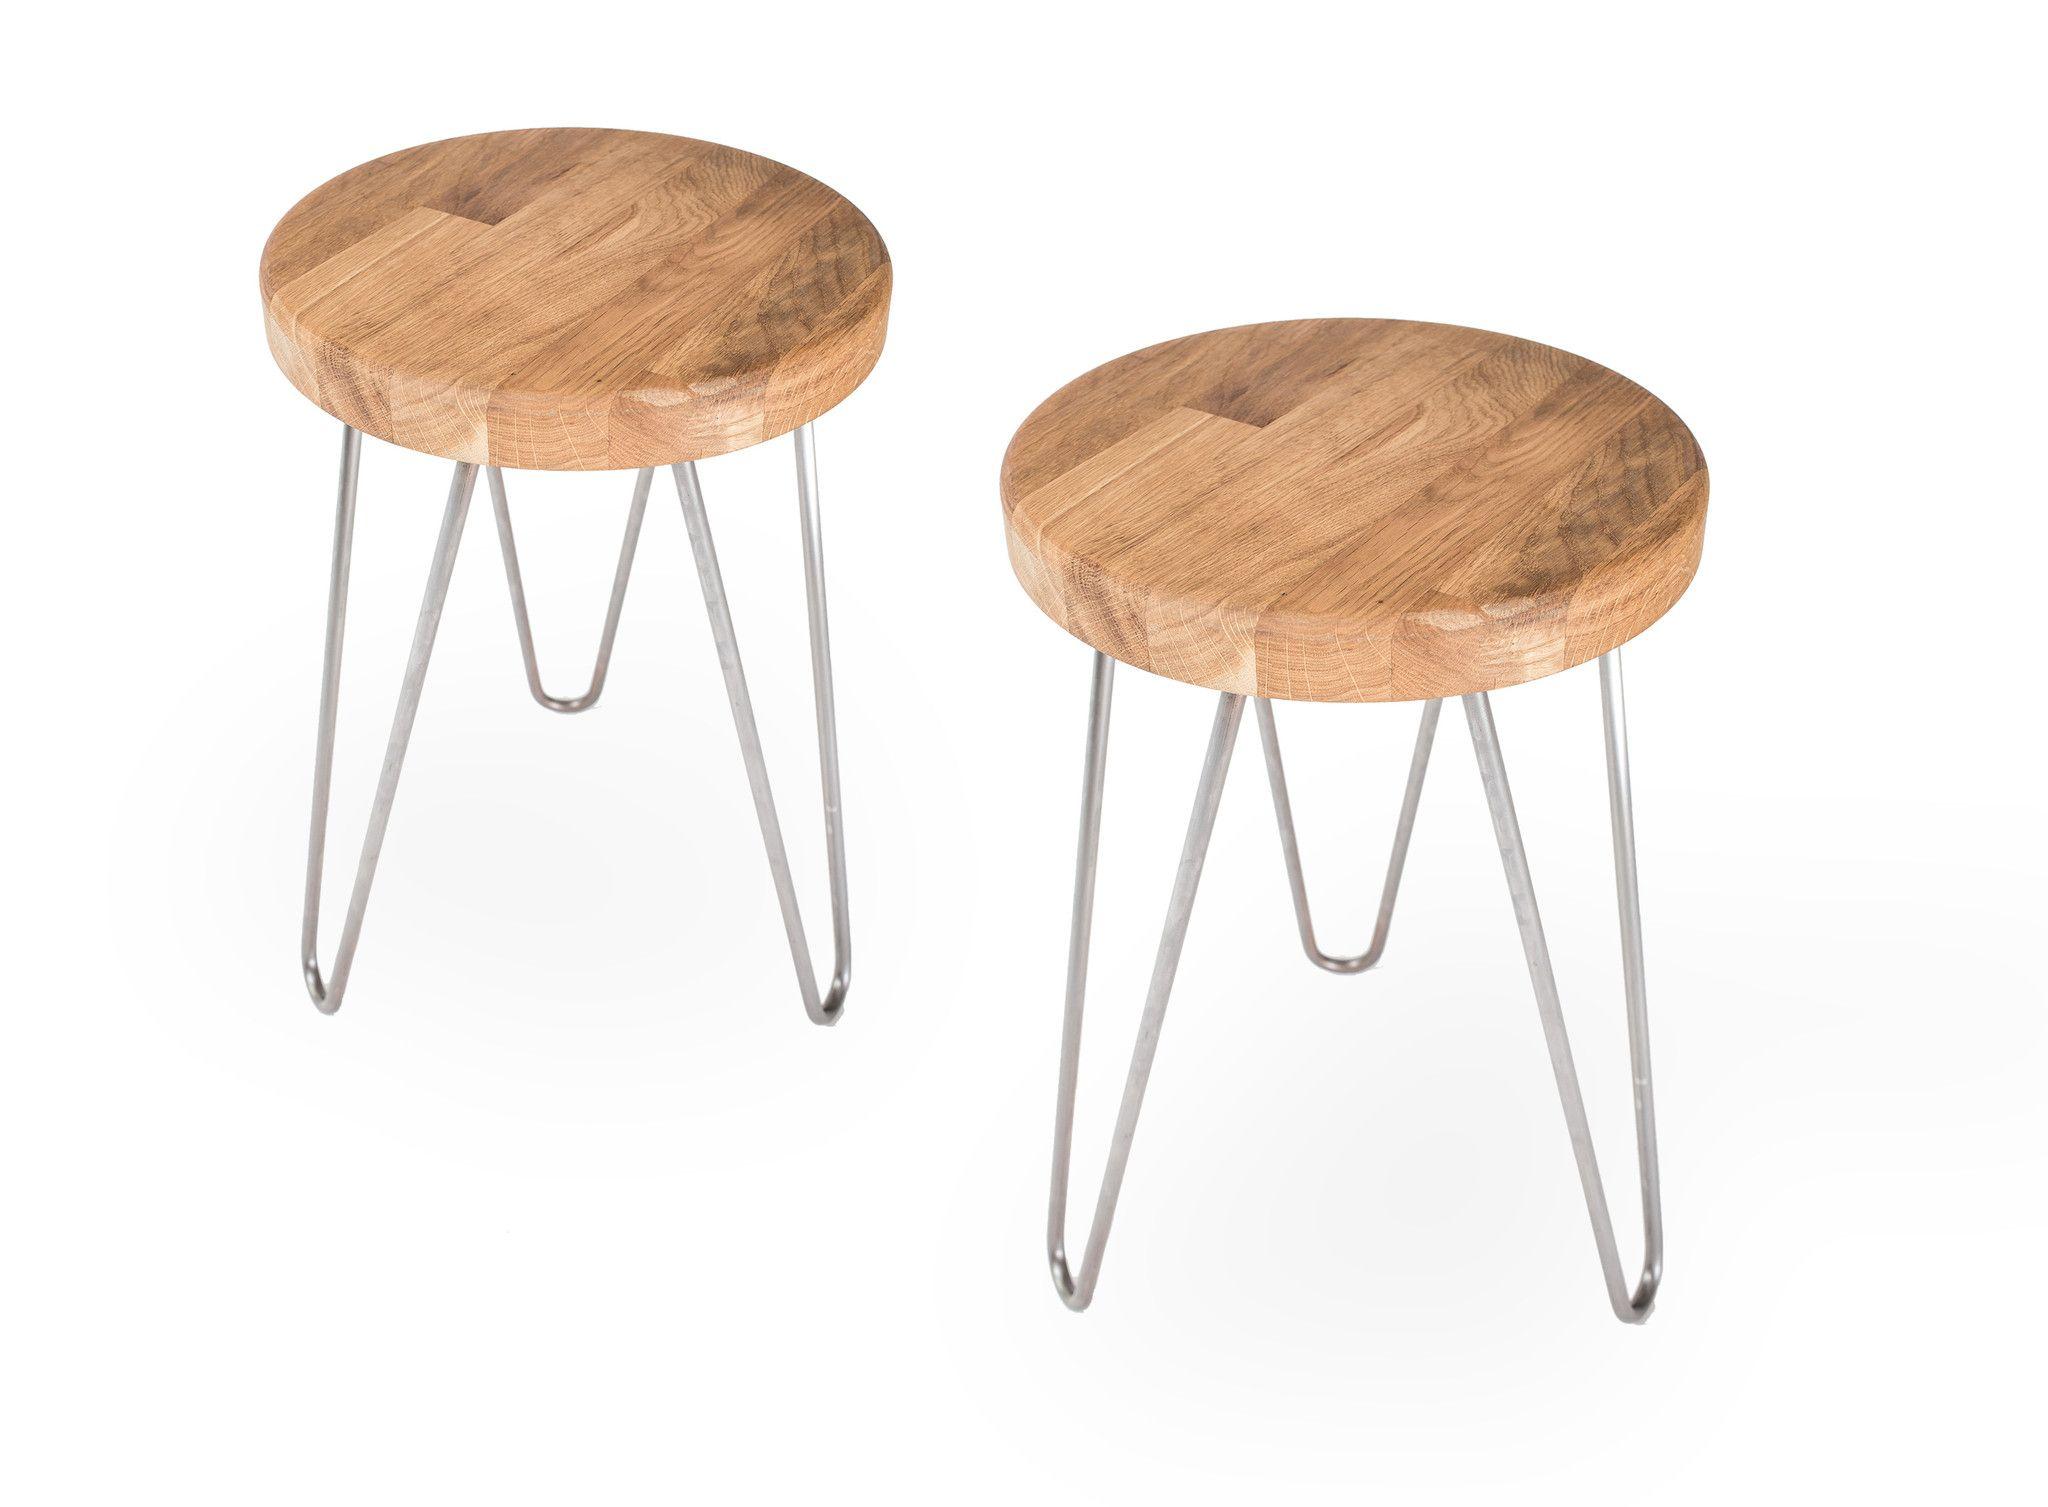 Oak Stools The Hairpin Leg Co Oak Stool Stool Stylish Bedside Tables